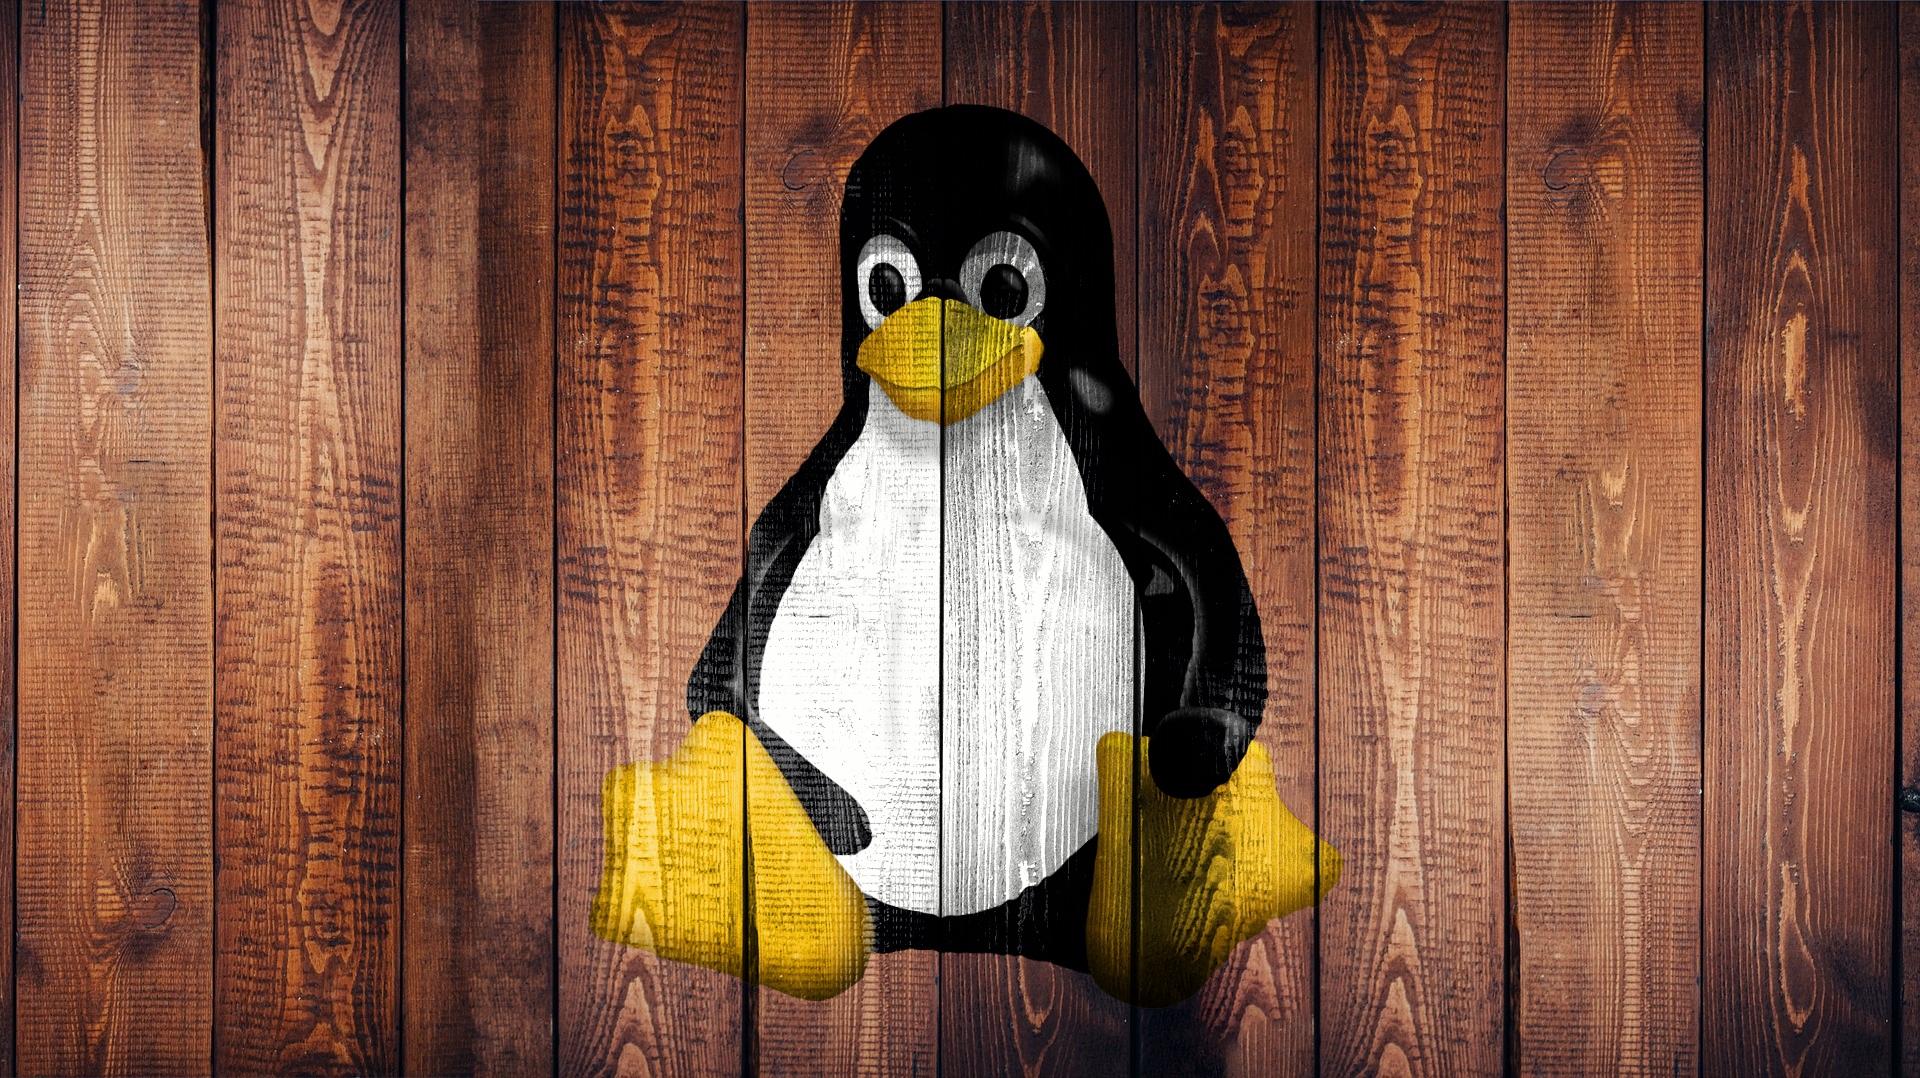 linux, laptop, screen